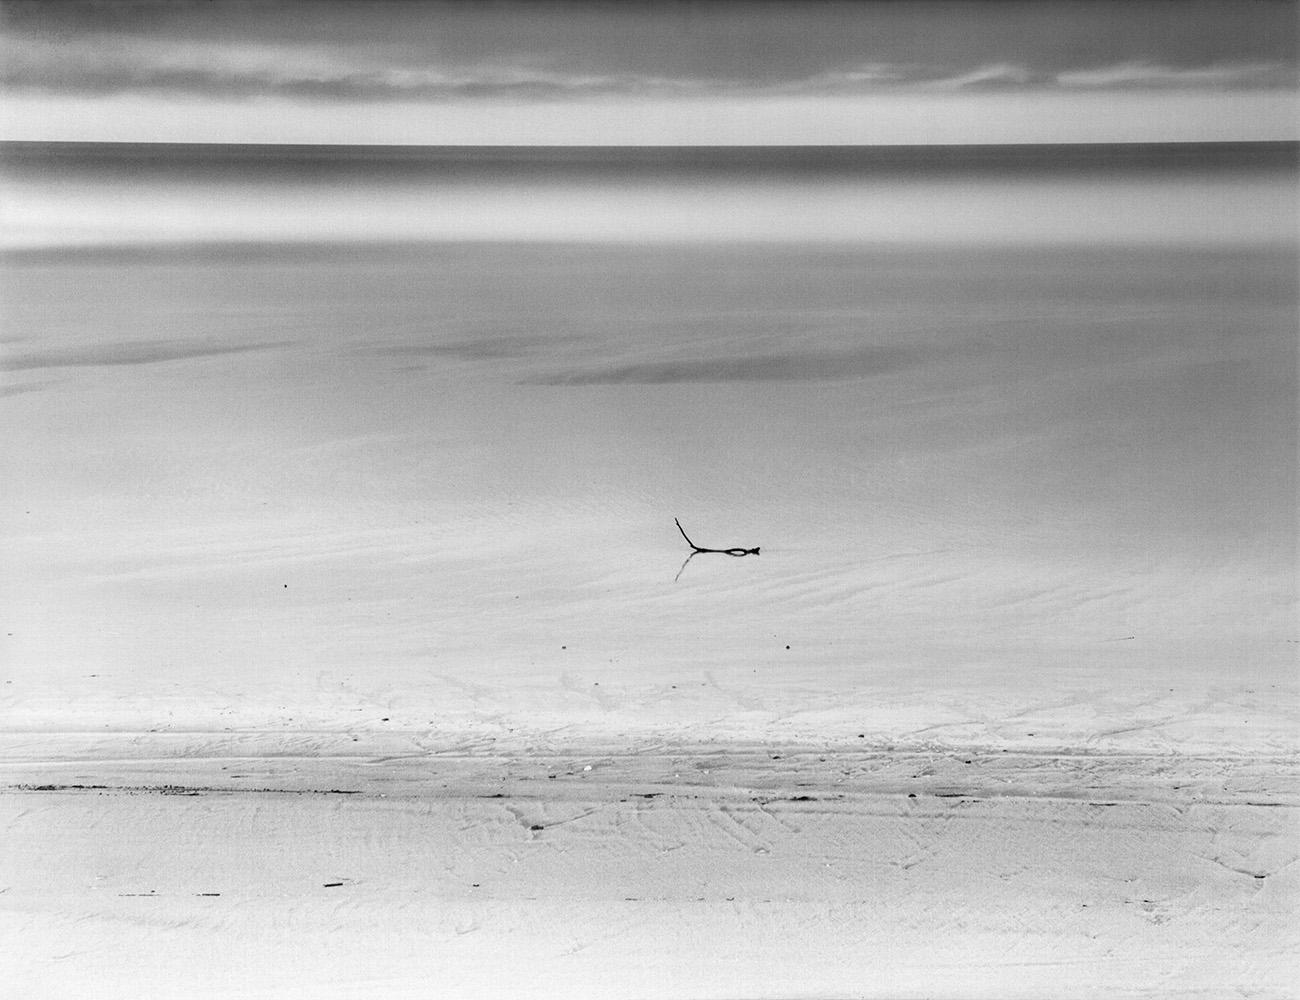 Barayo - FERNANDO PUCHE,  NATURE  PHOTOGRAPHY  BEYOND  OBVIOUS